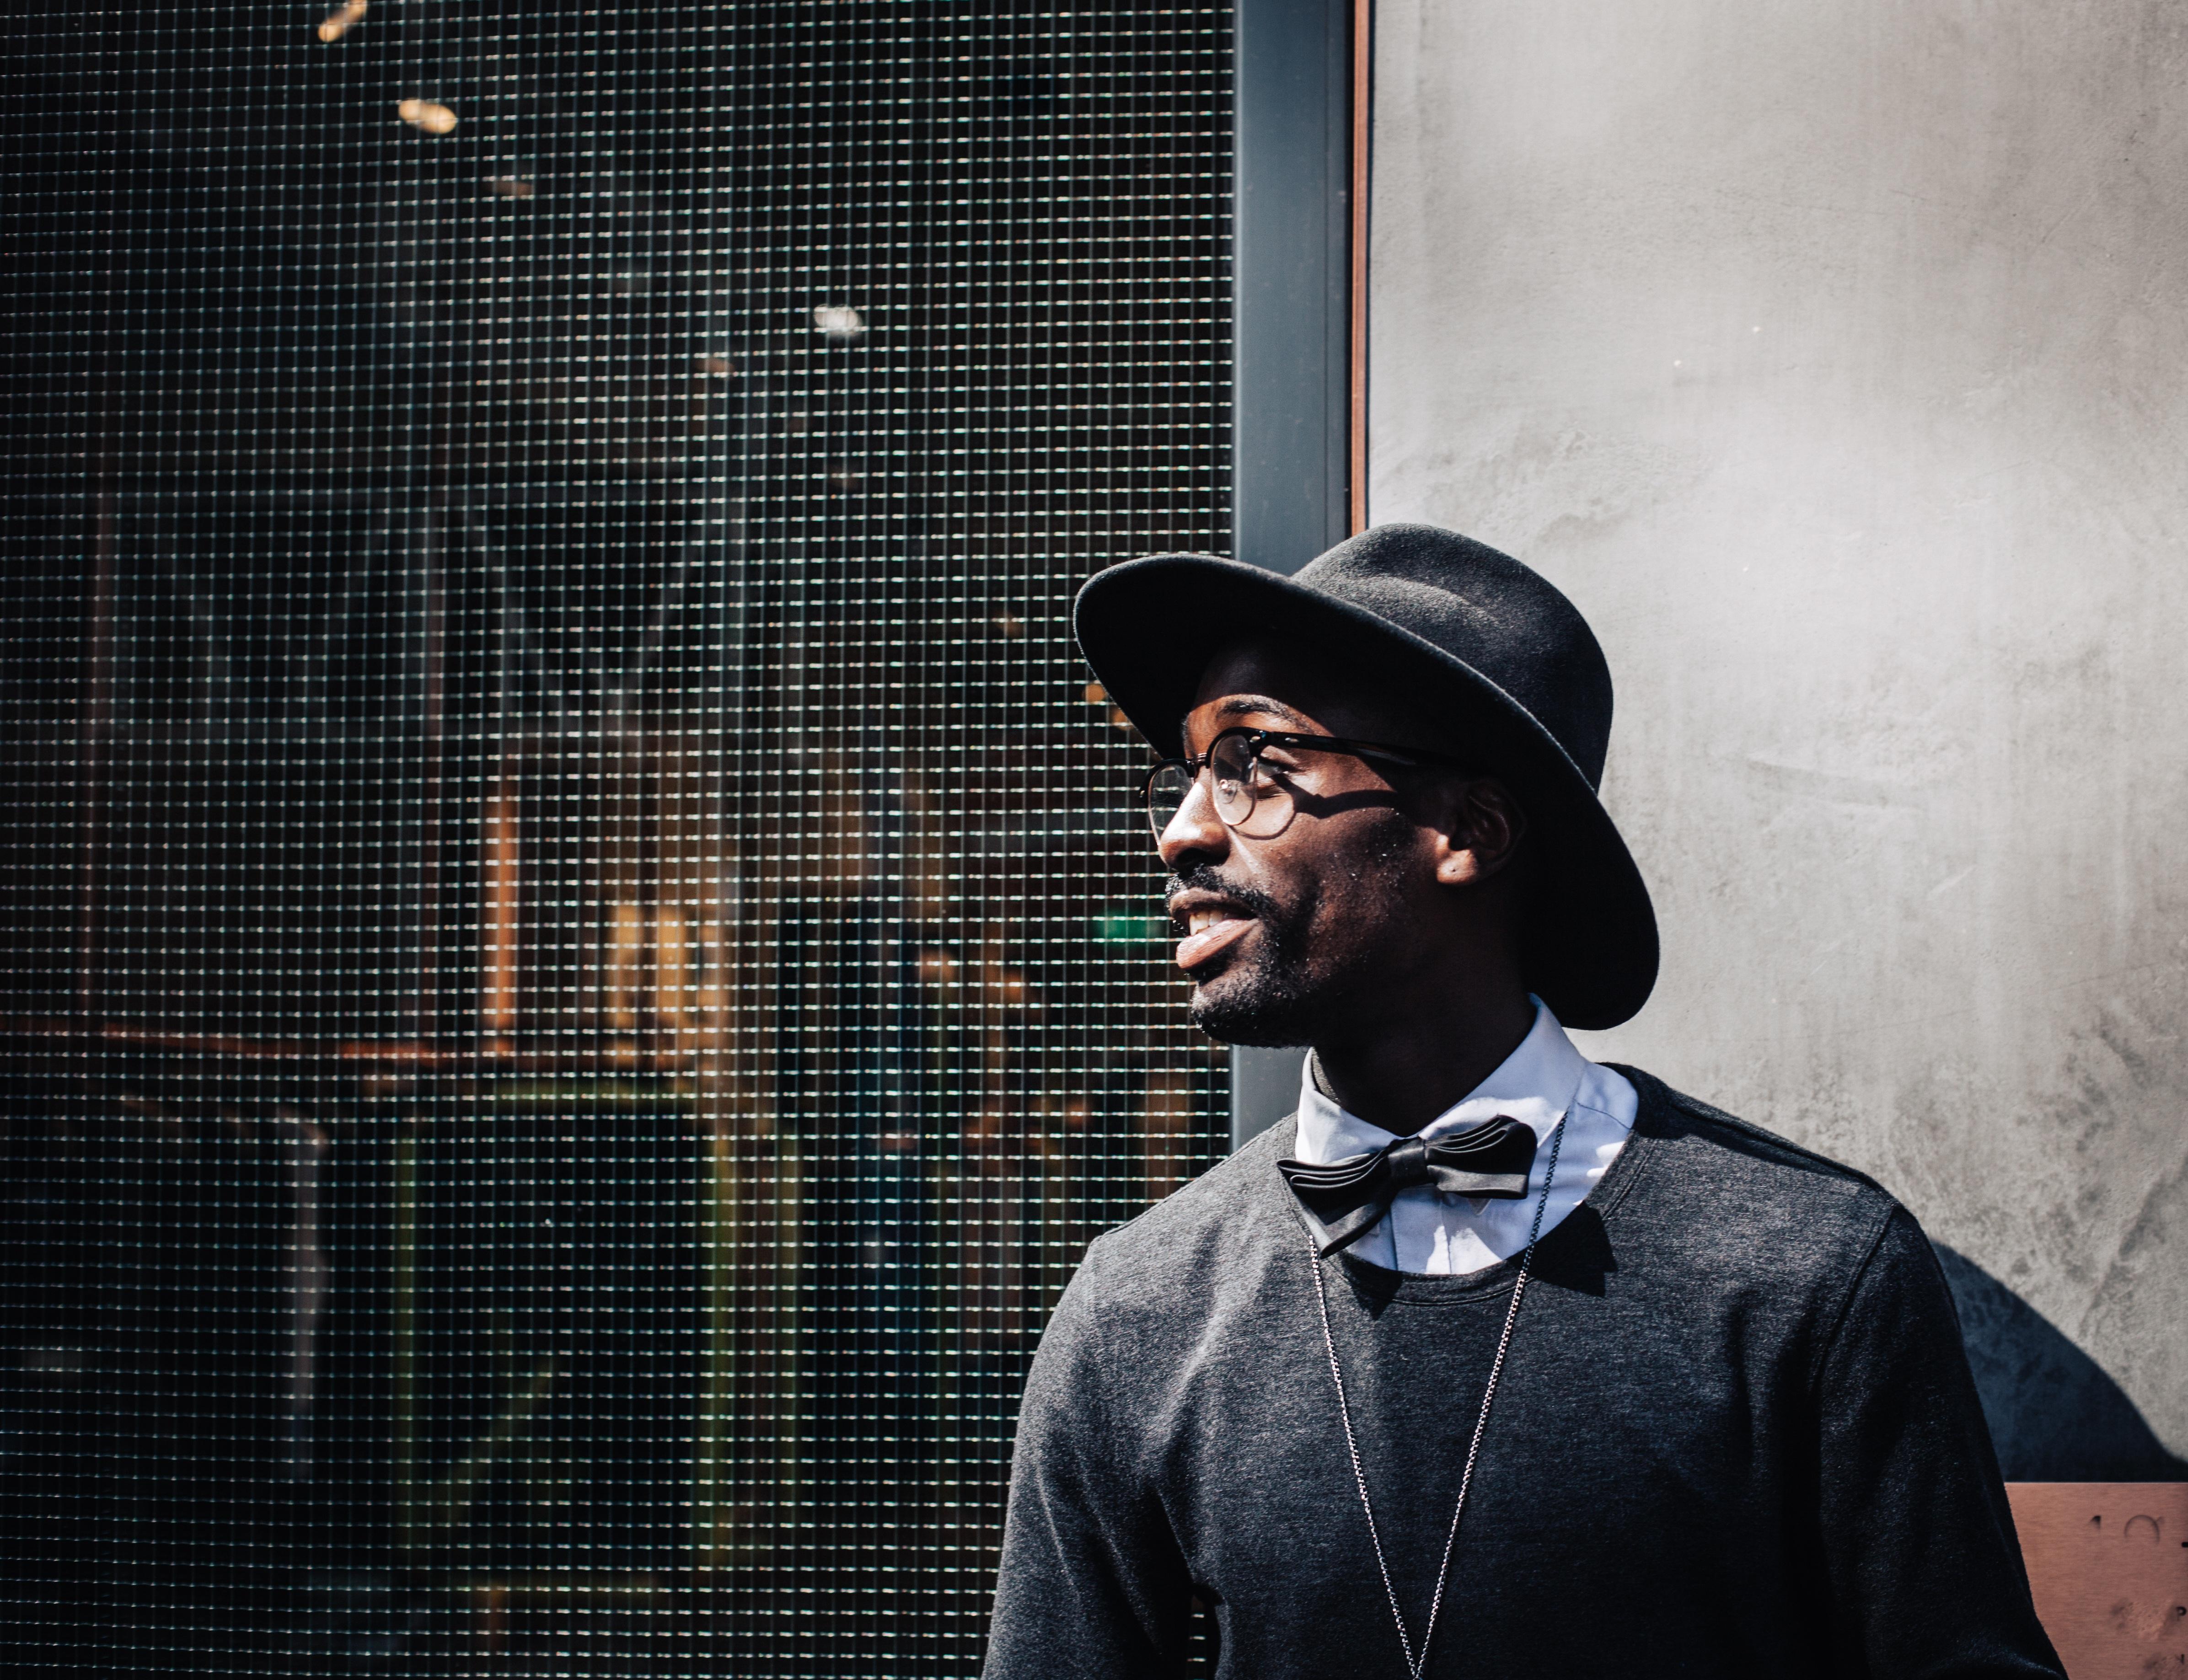 man person music wall color hat fashion blue black smile eyeglasses  photograph fedora 1f58e2136e89